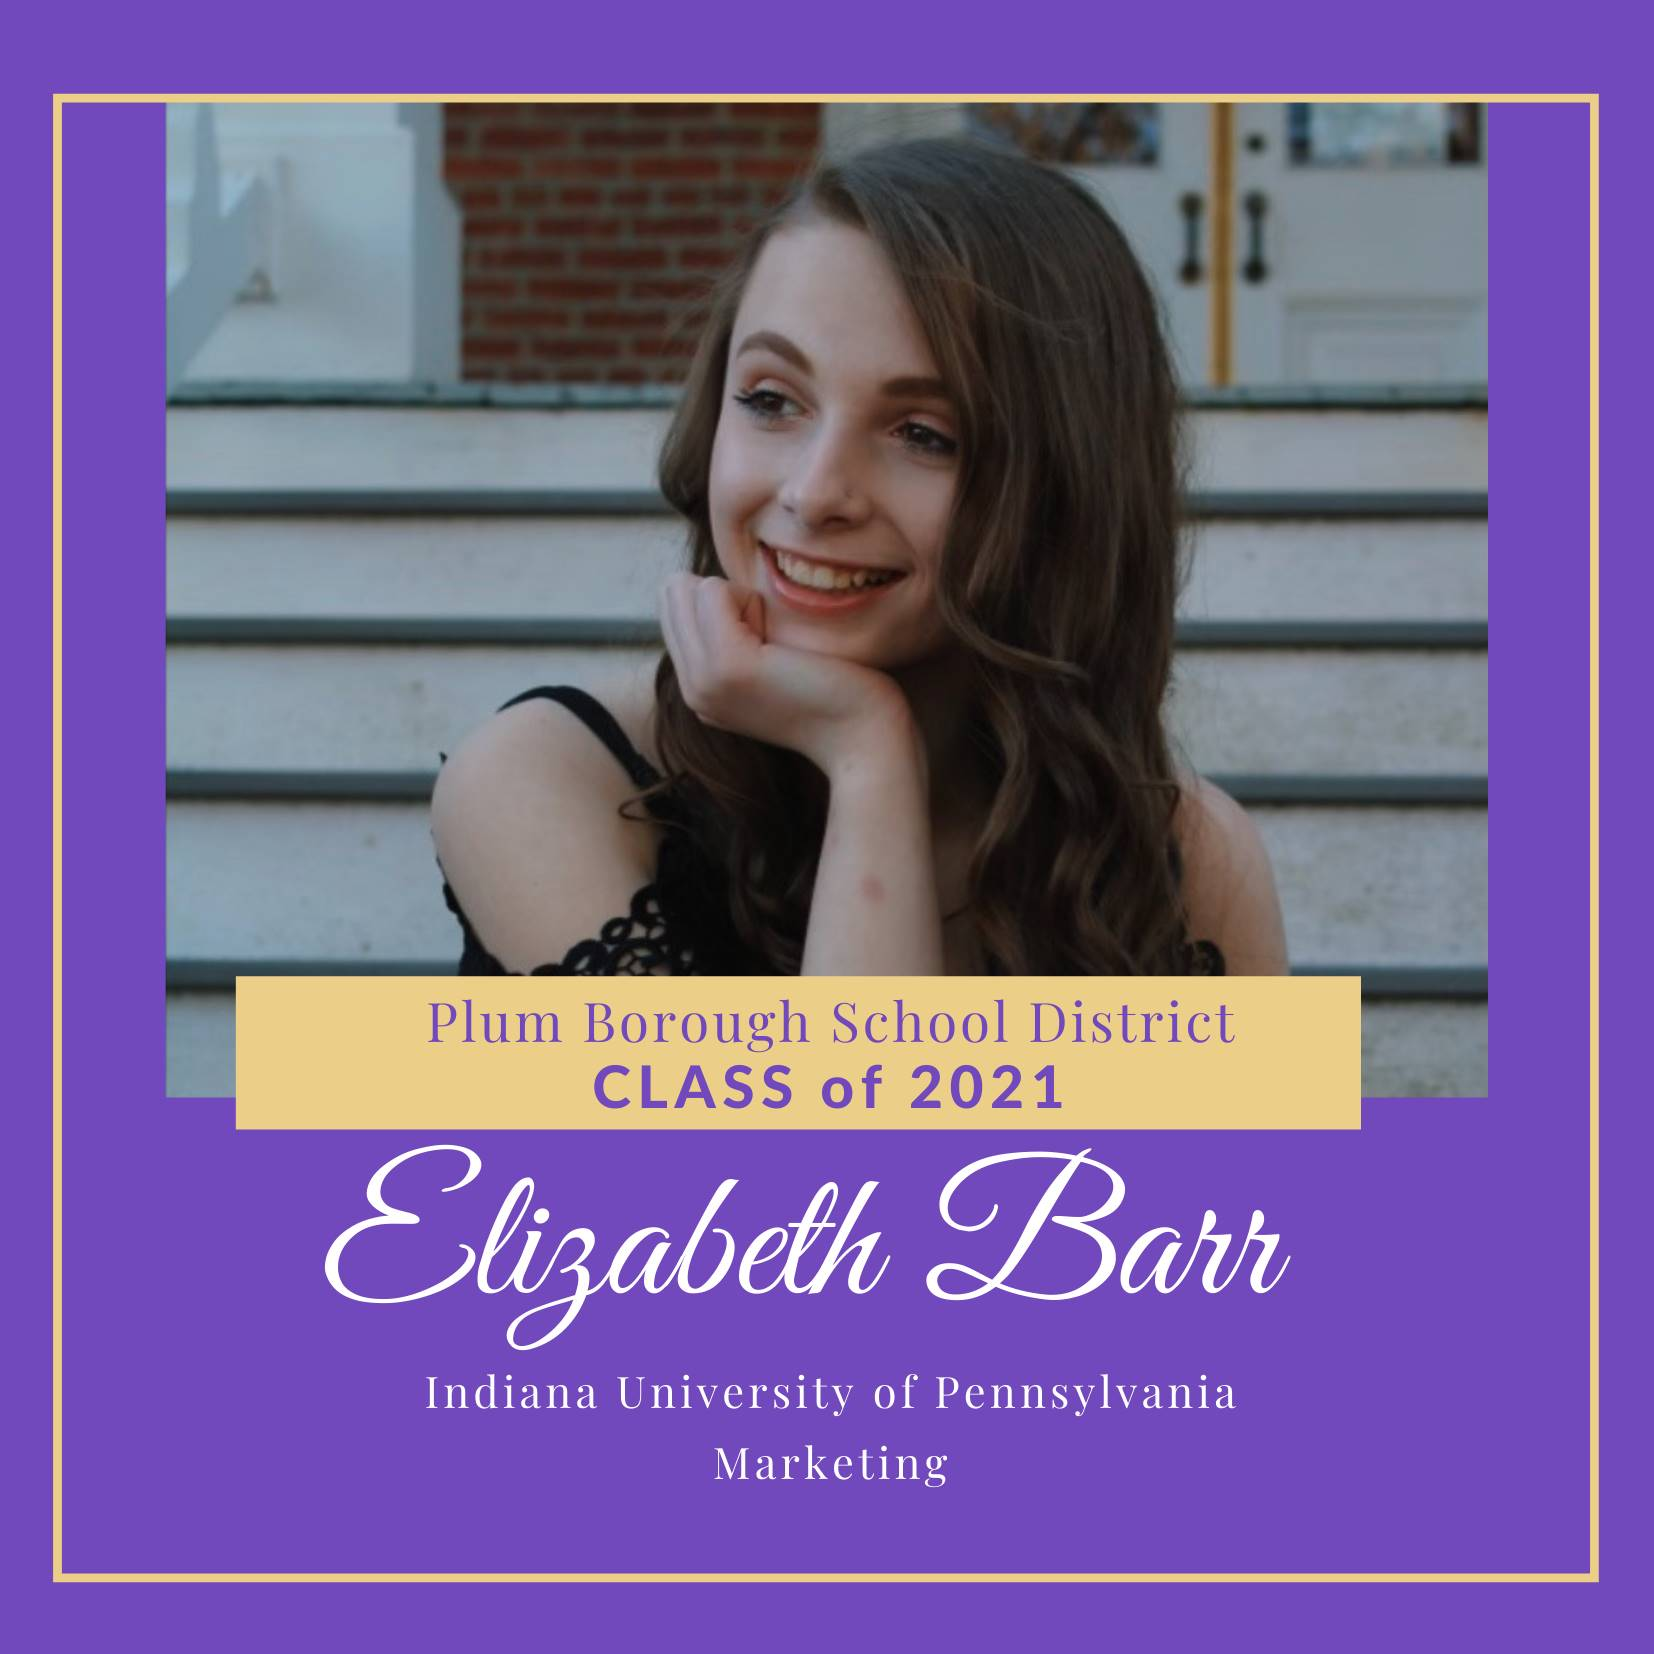 Congratulations to Elizabeth Barr, Class of 2021!